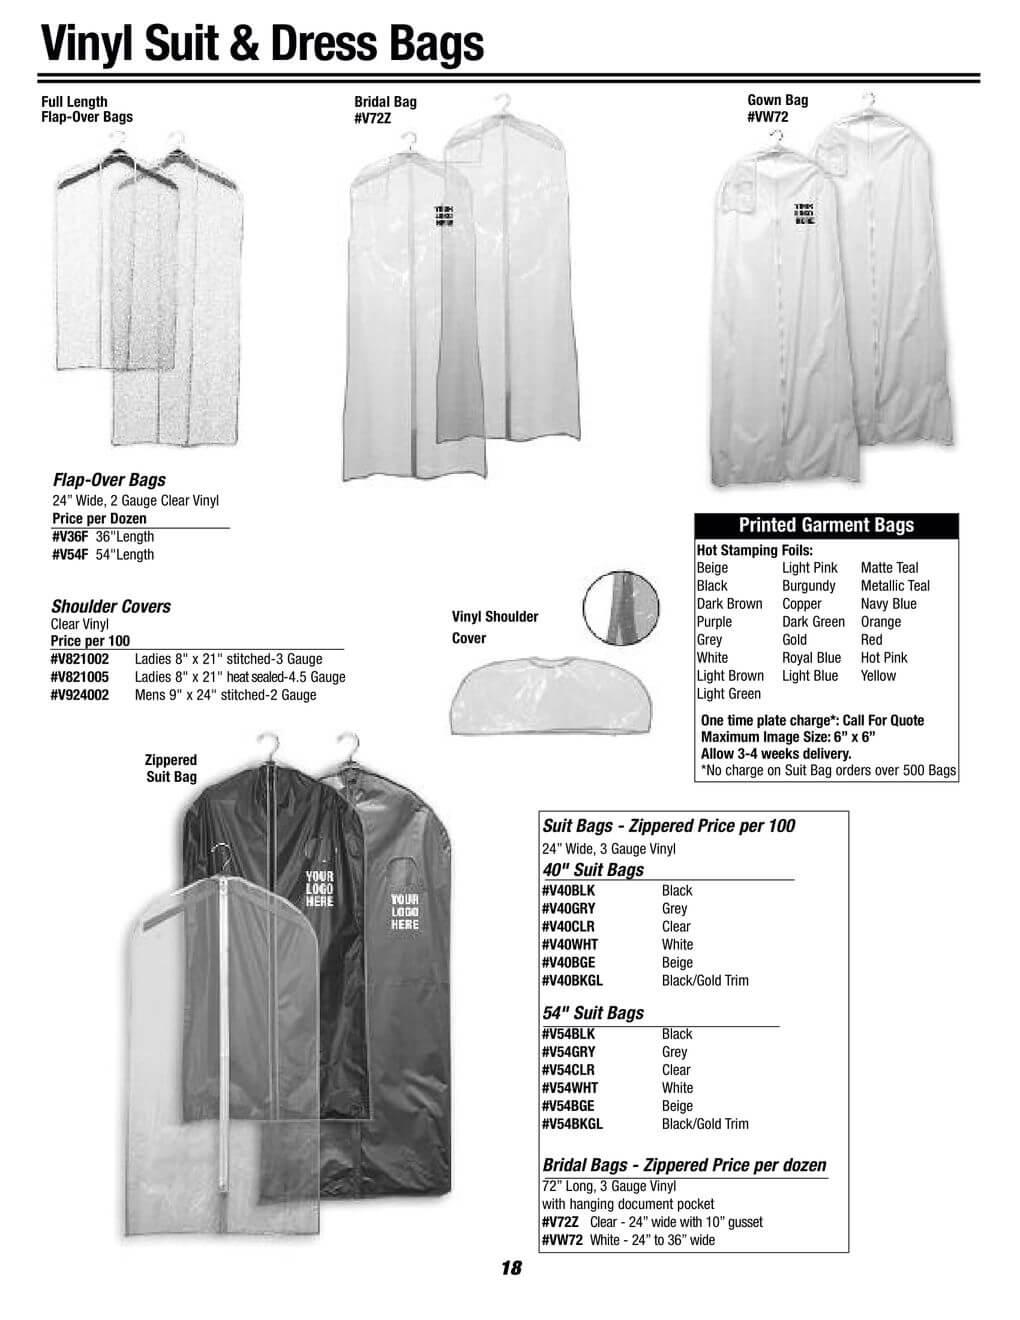 garment bags - vinyl and dress